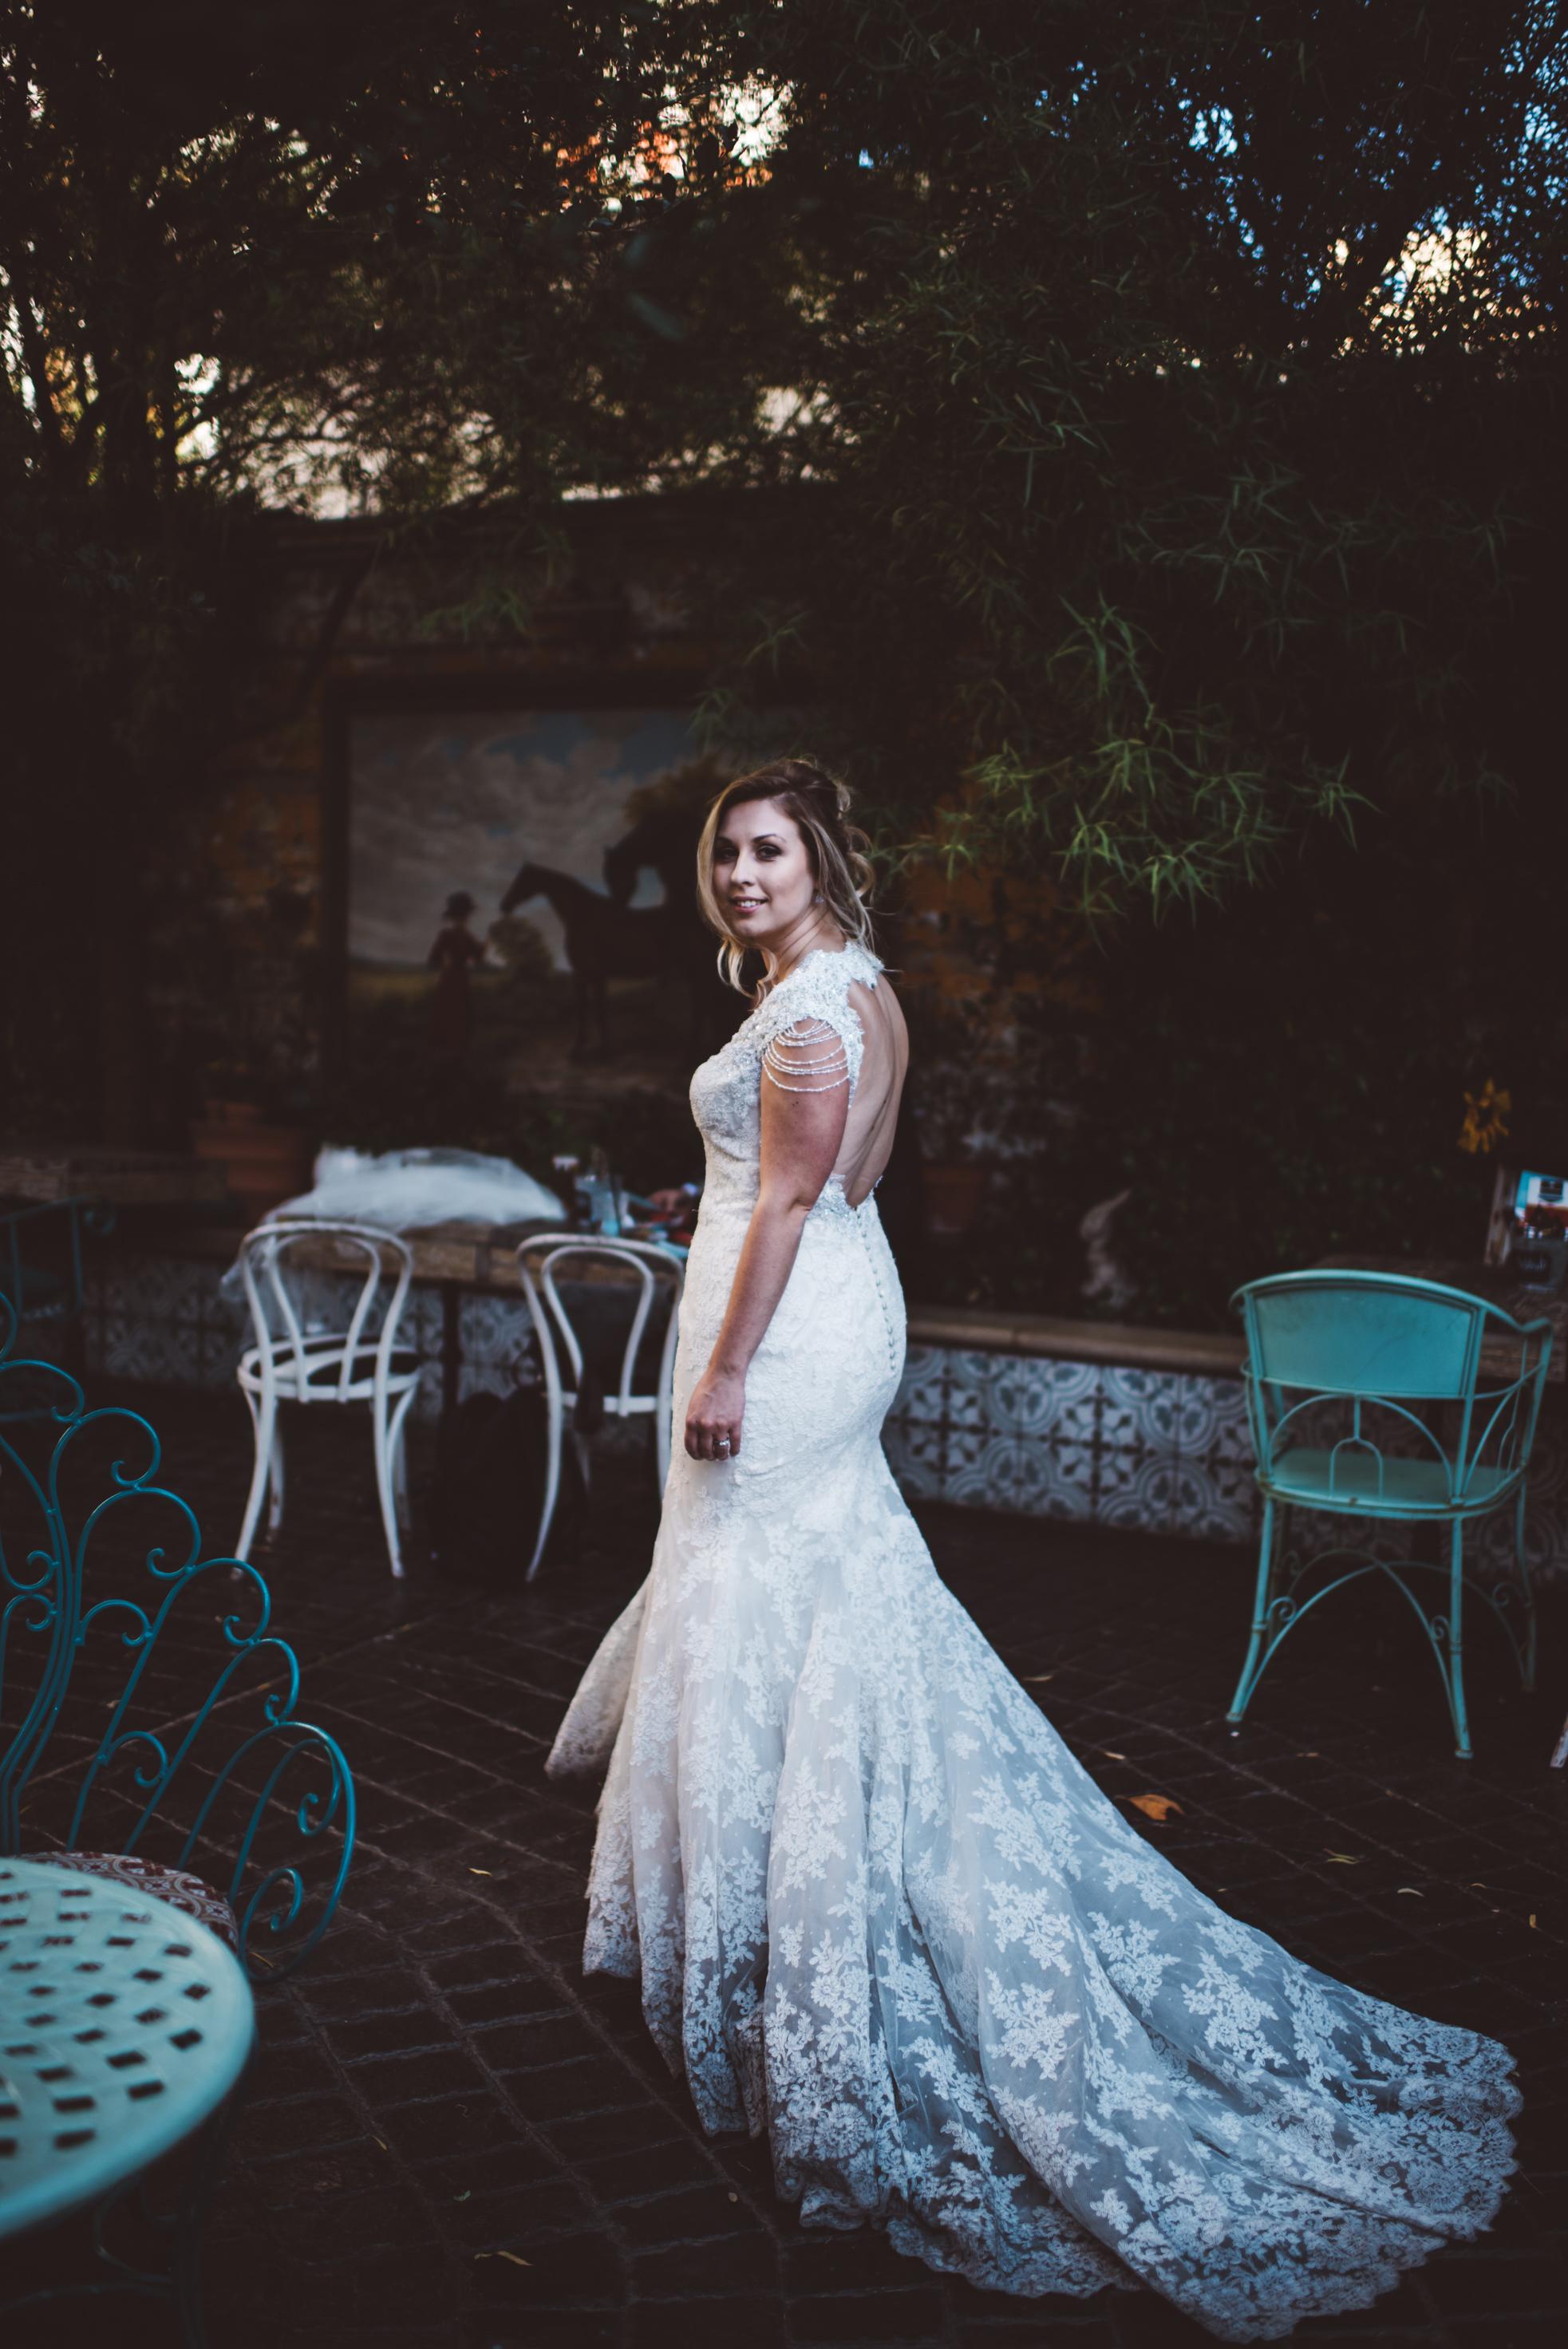 Las Vegas Elopement Photographer Ashley Marie Myers Rock'n Roll Bride-57.jpg